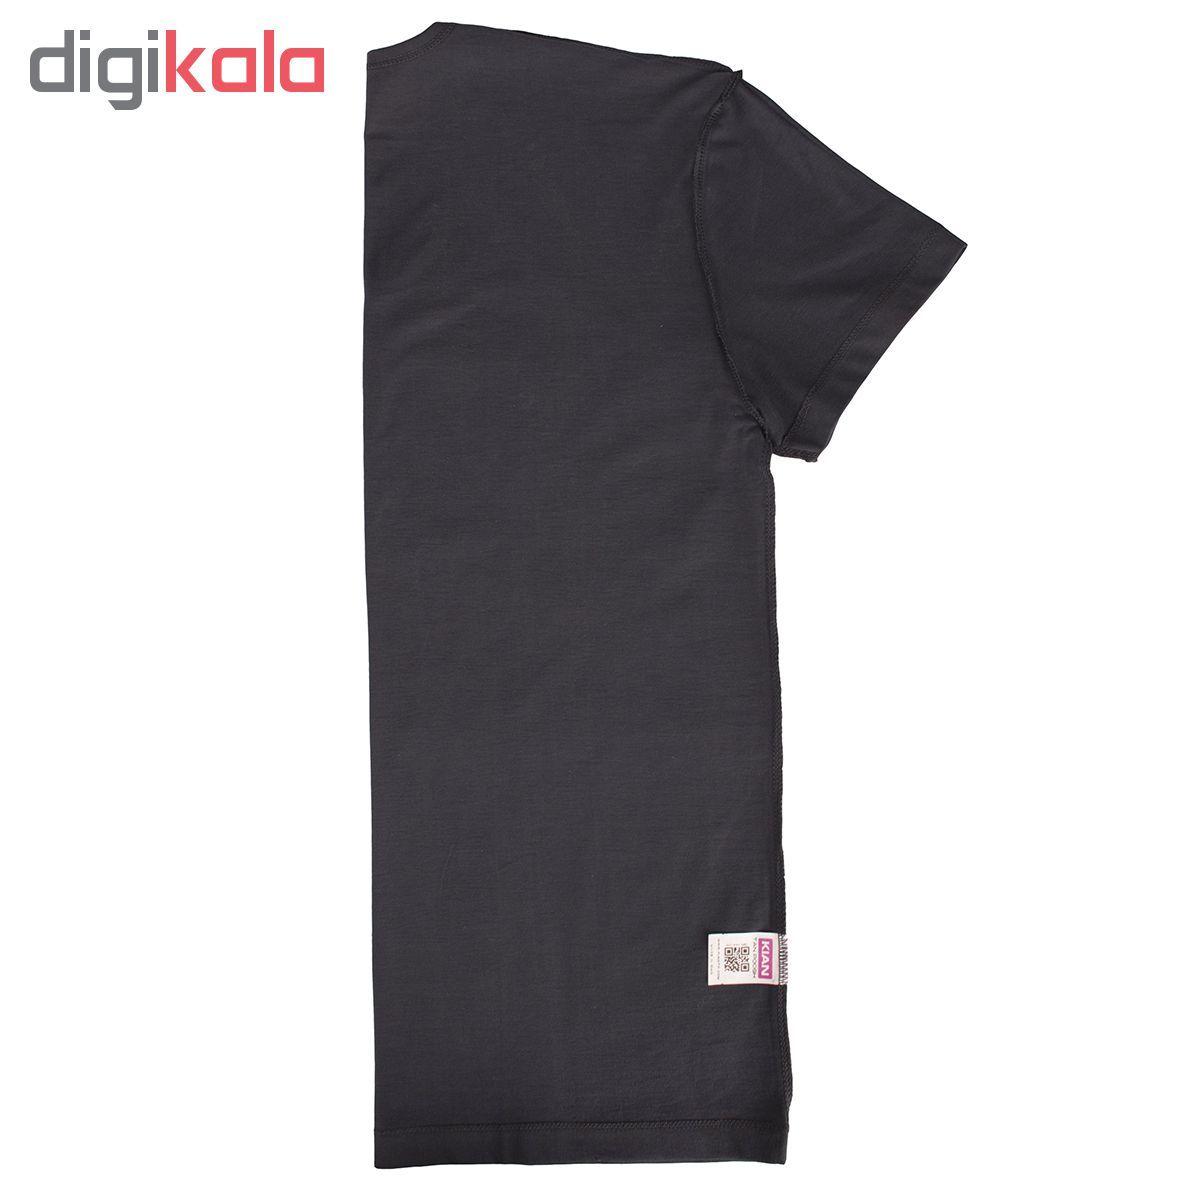 زیرپوش مردانه کیان تن پوش مدل U Neck Shirt Classic PE main 1 2